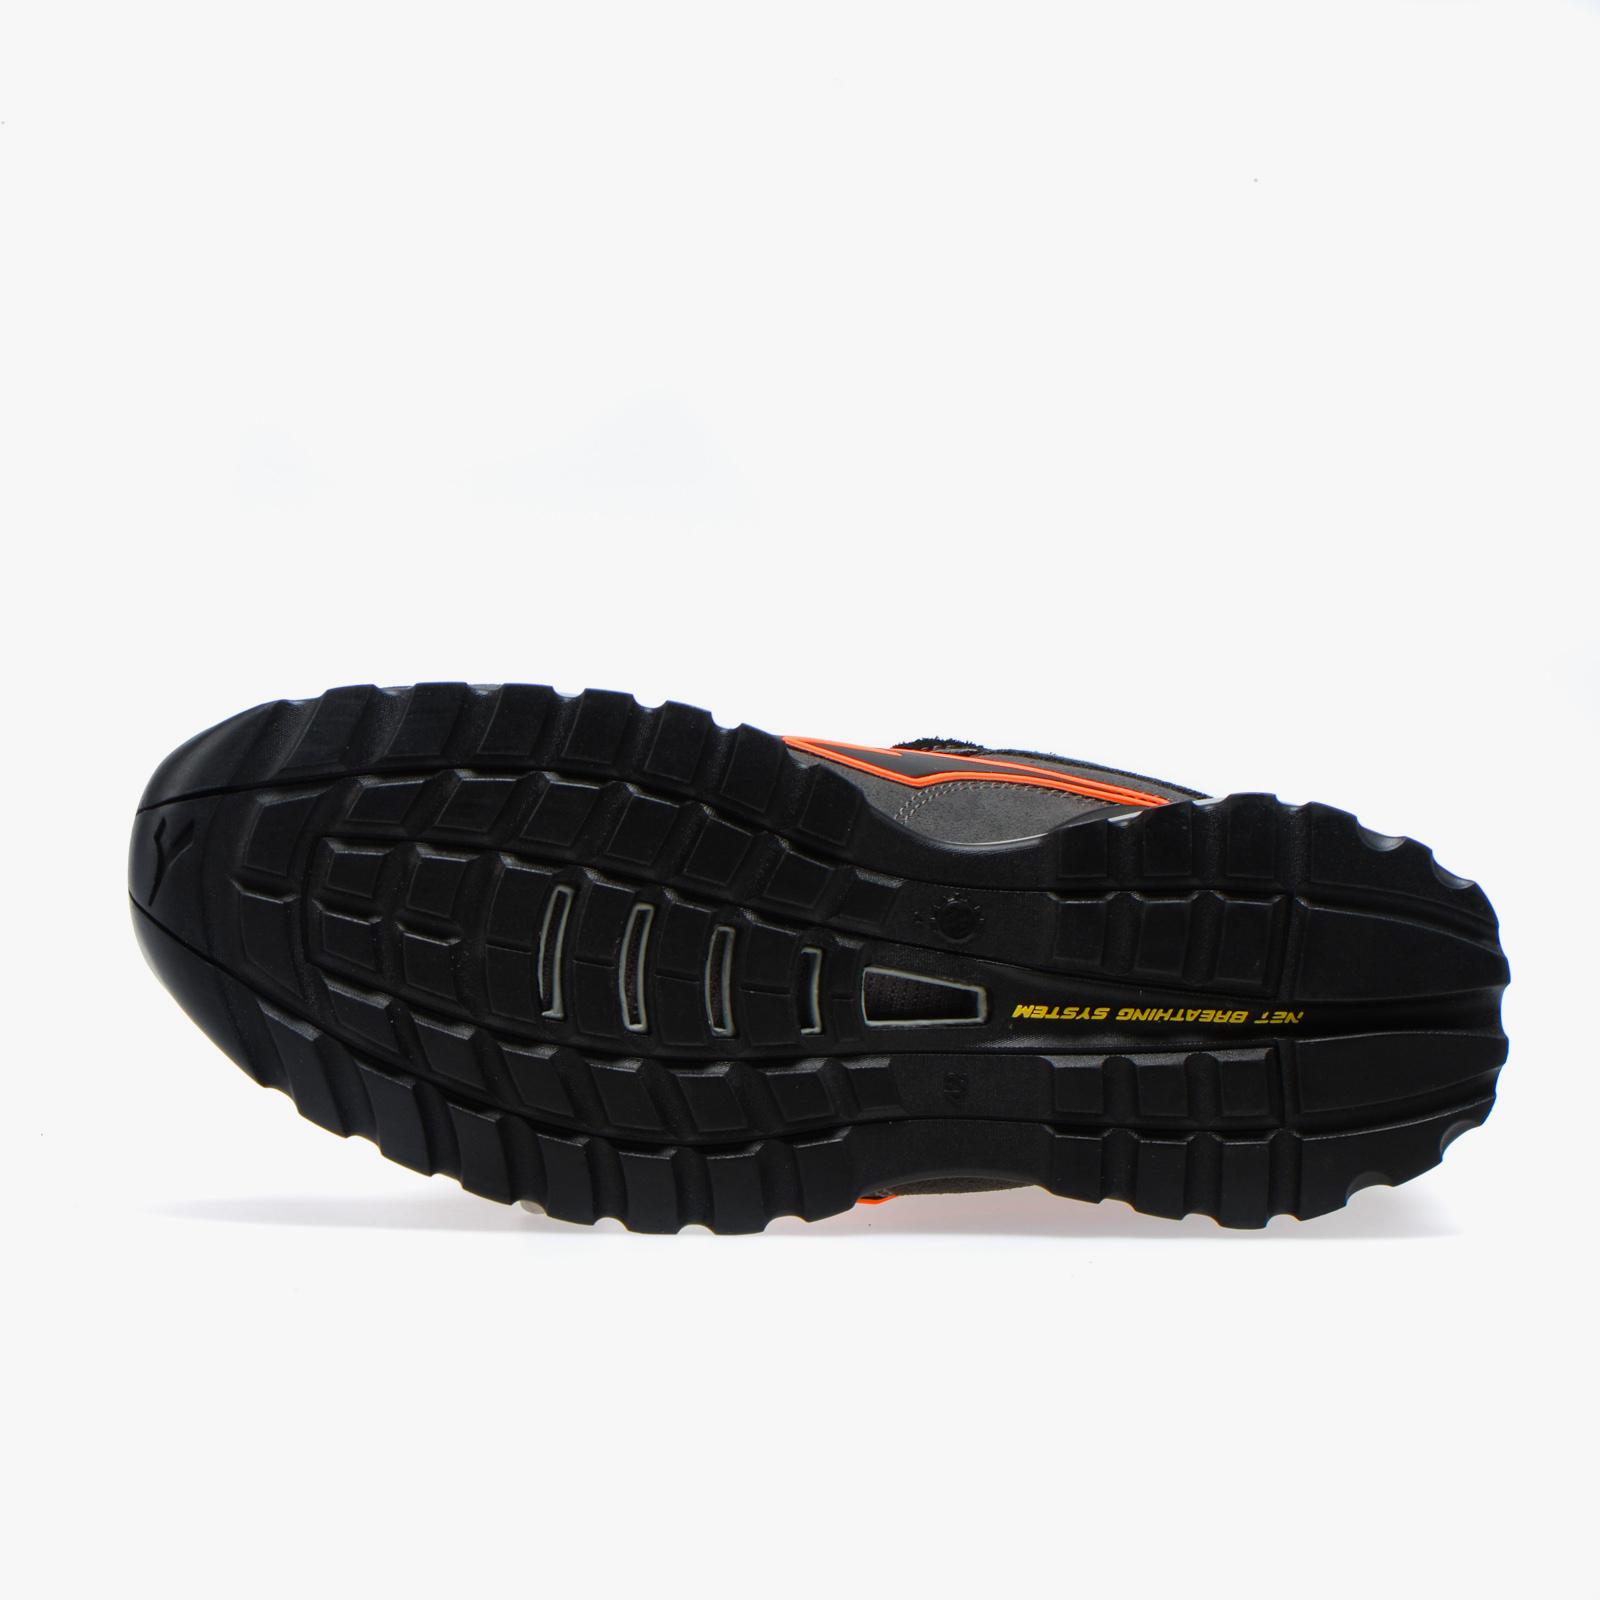 Scarpe antinfortunistiche Diadora Glove Tech High Pro S3 SRA HRO ESD 173527 (80013) GEOX